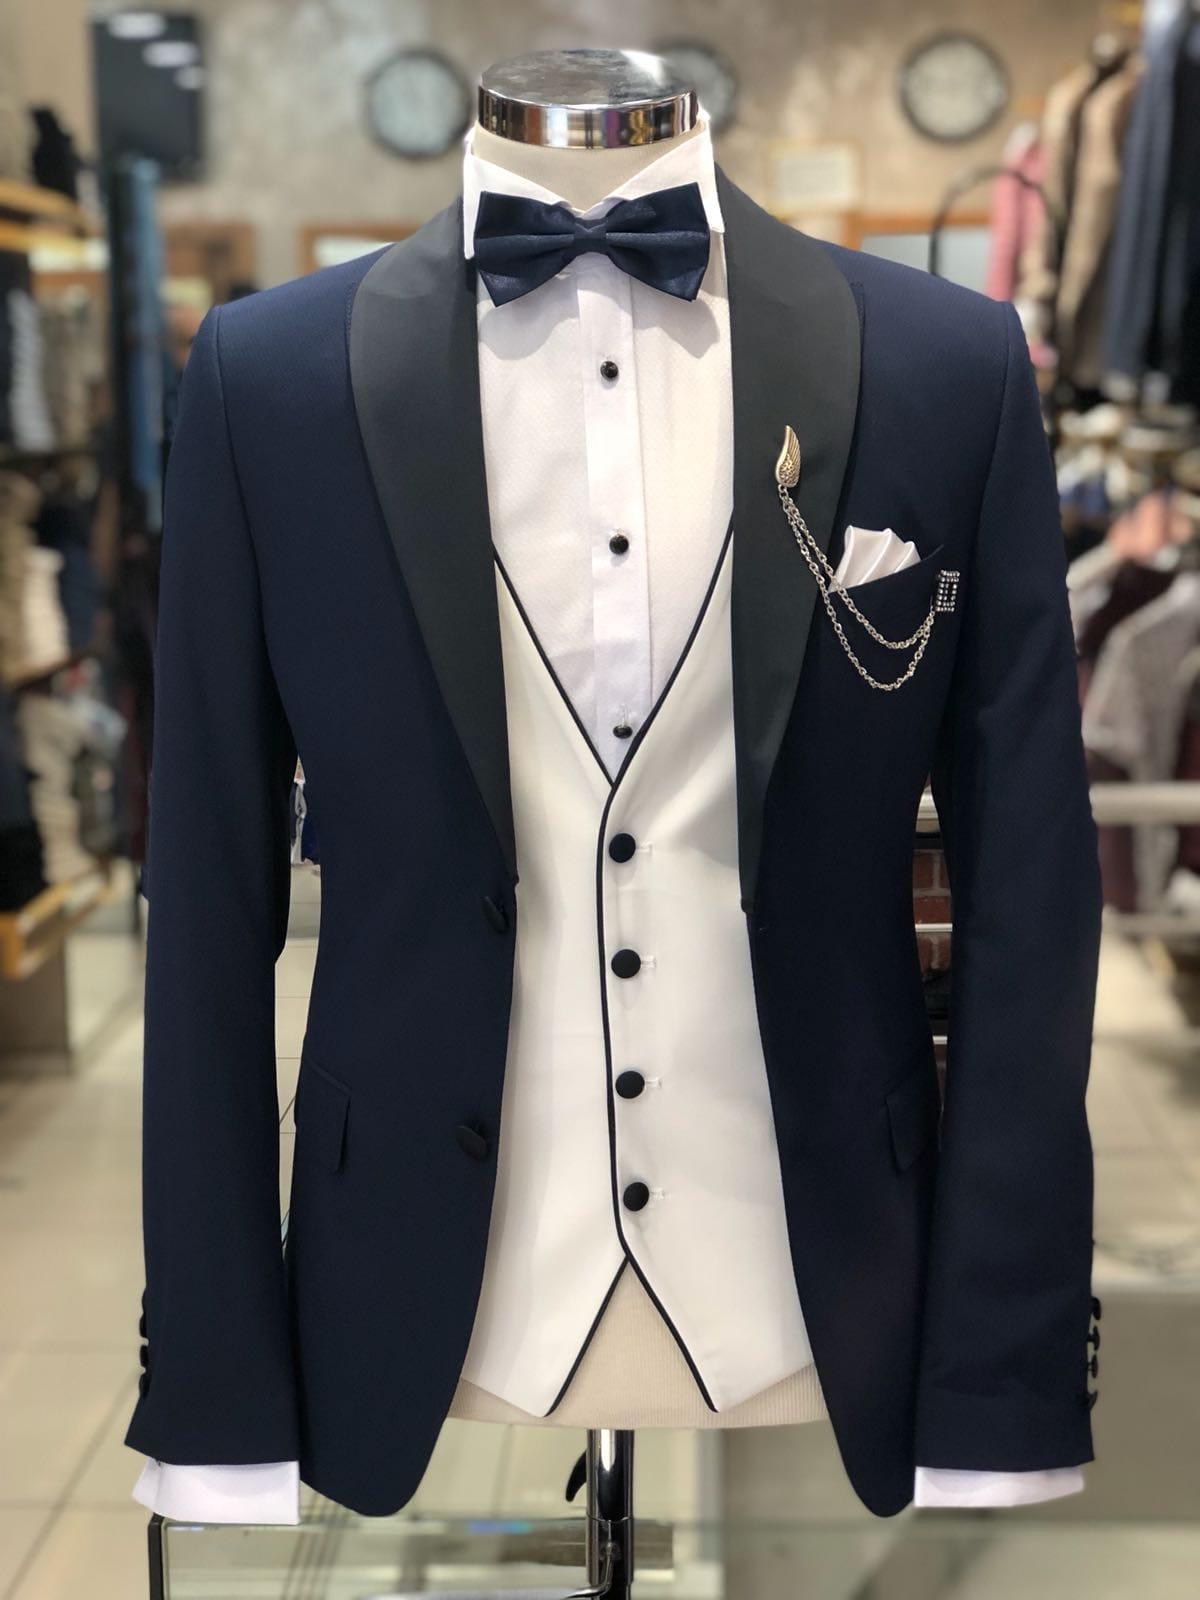 Groom Tuxedos Ideas by GentWith.com